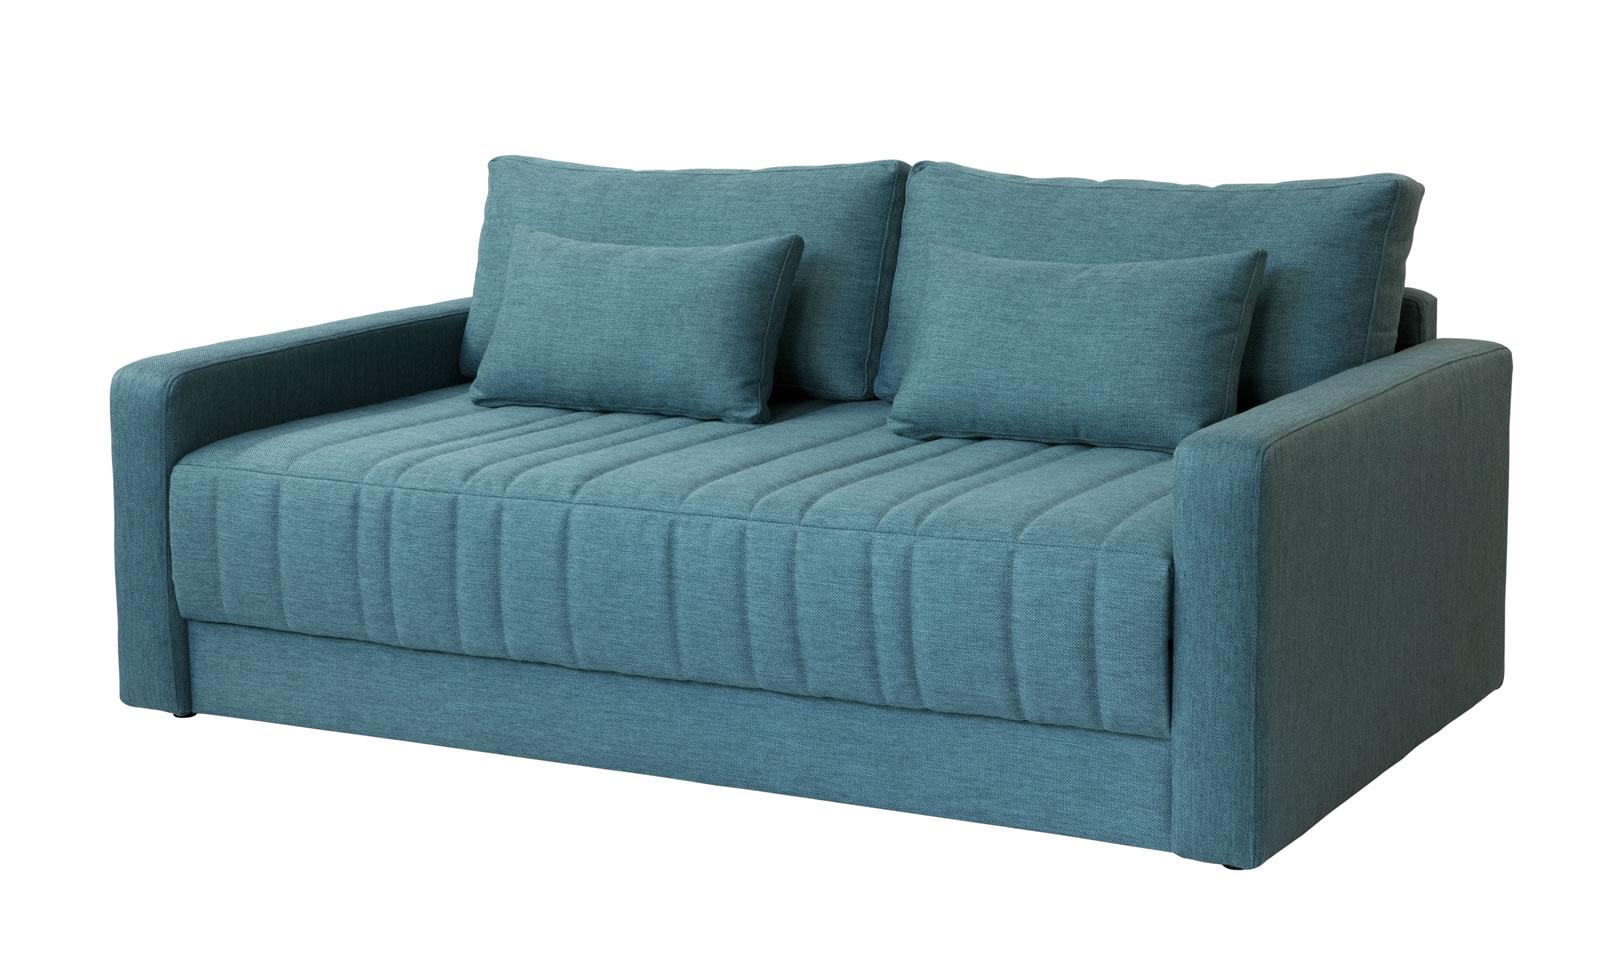 sofa cama walmart brasil hammary table sofá futon fernando jaeger